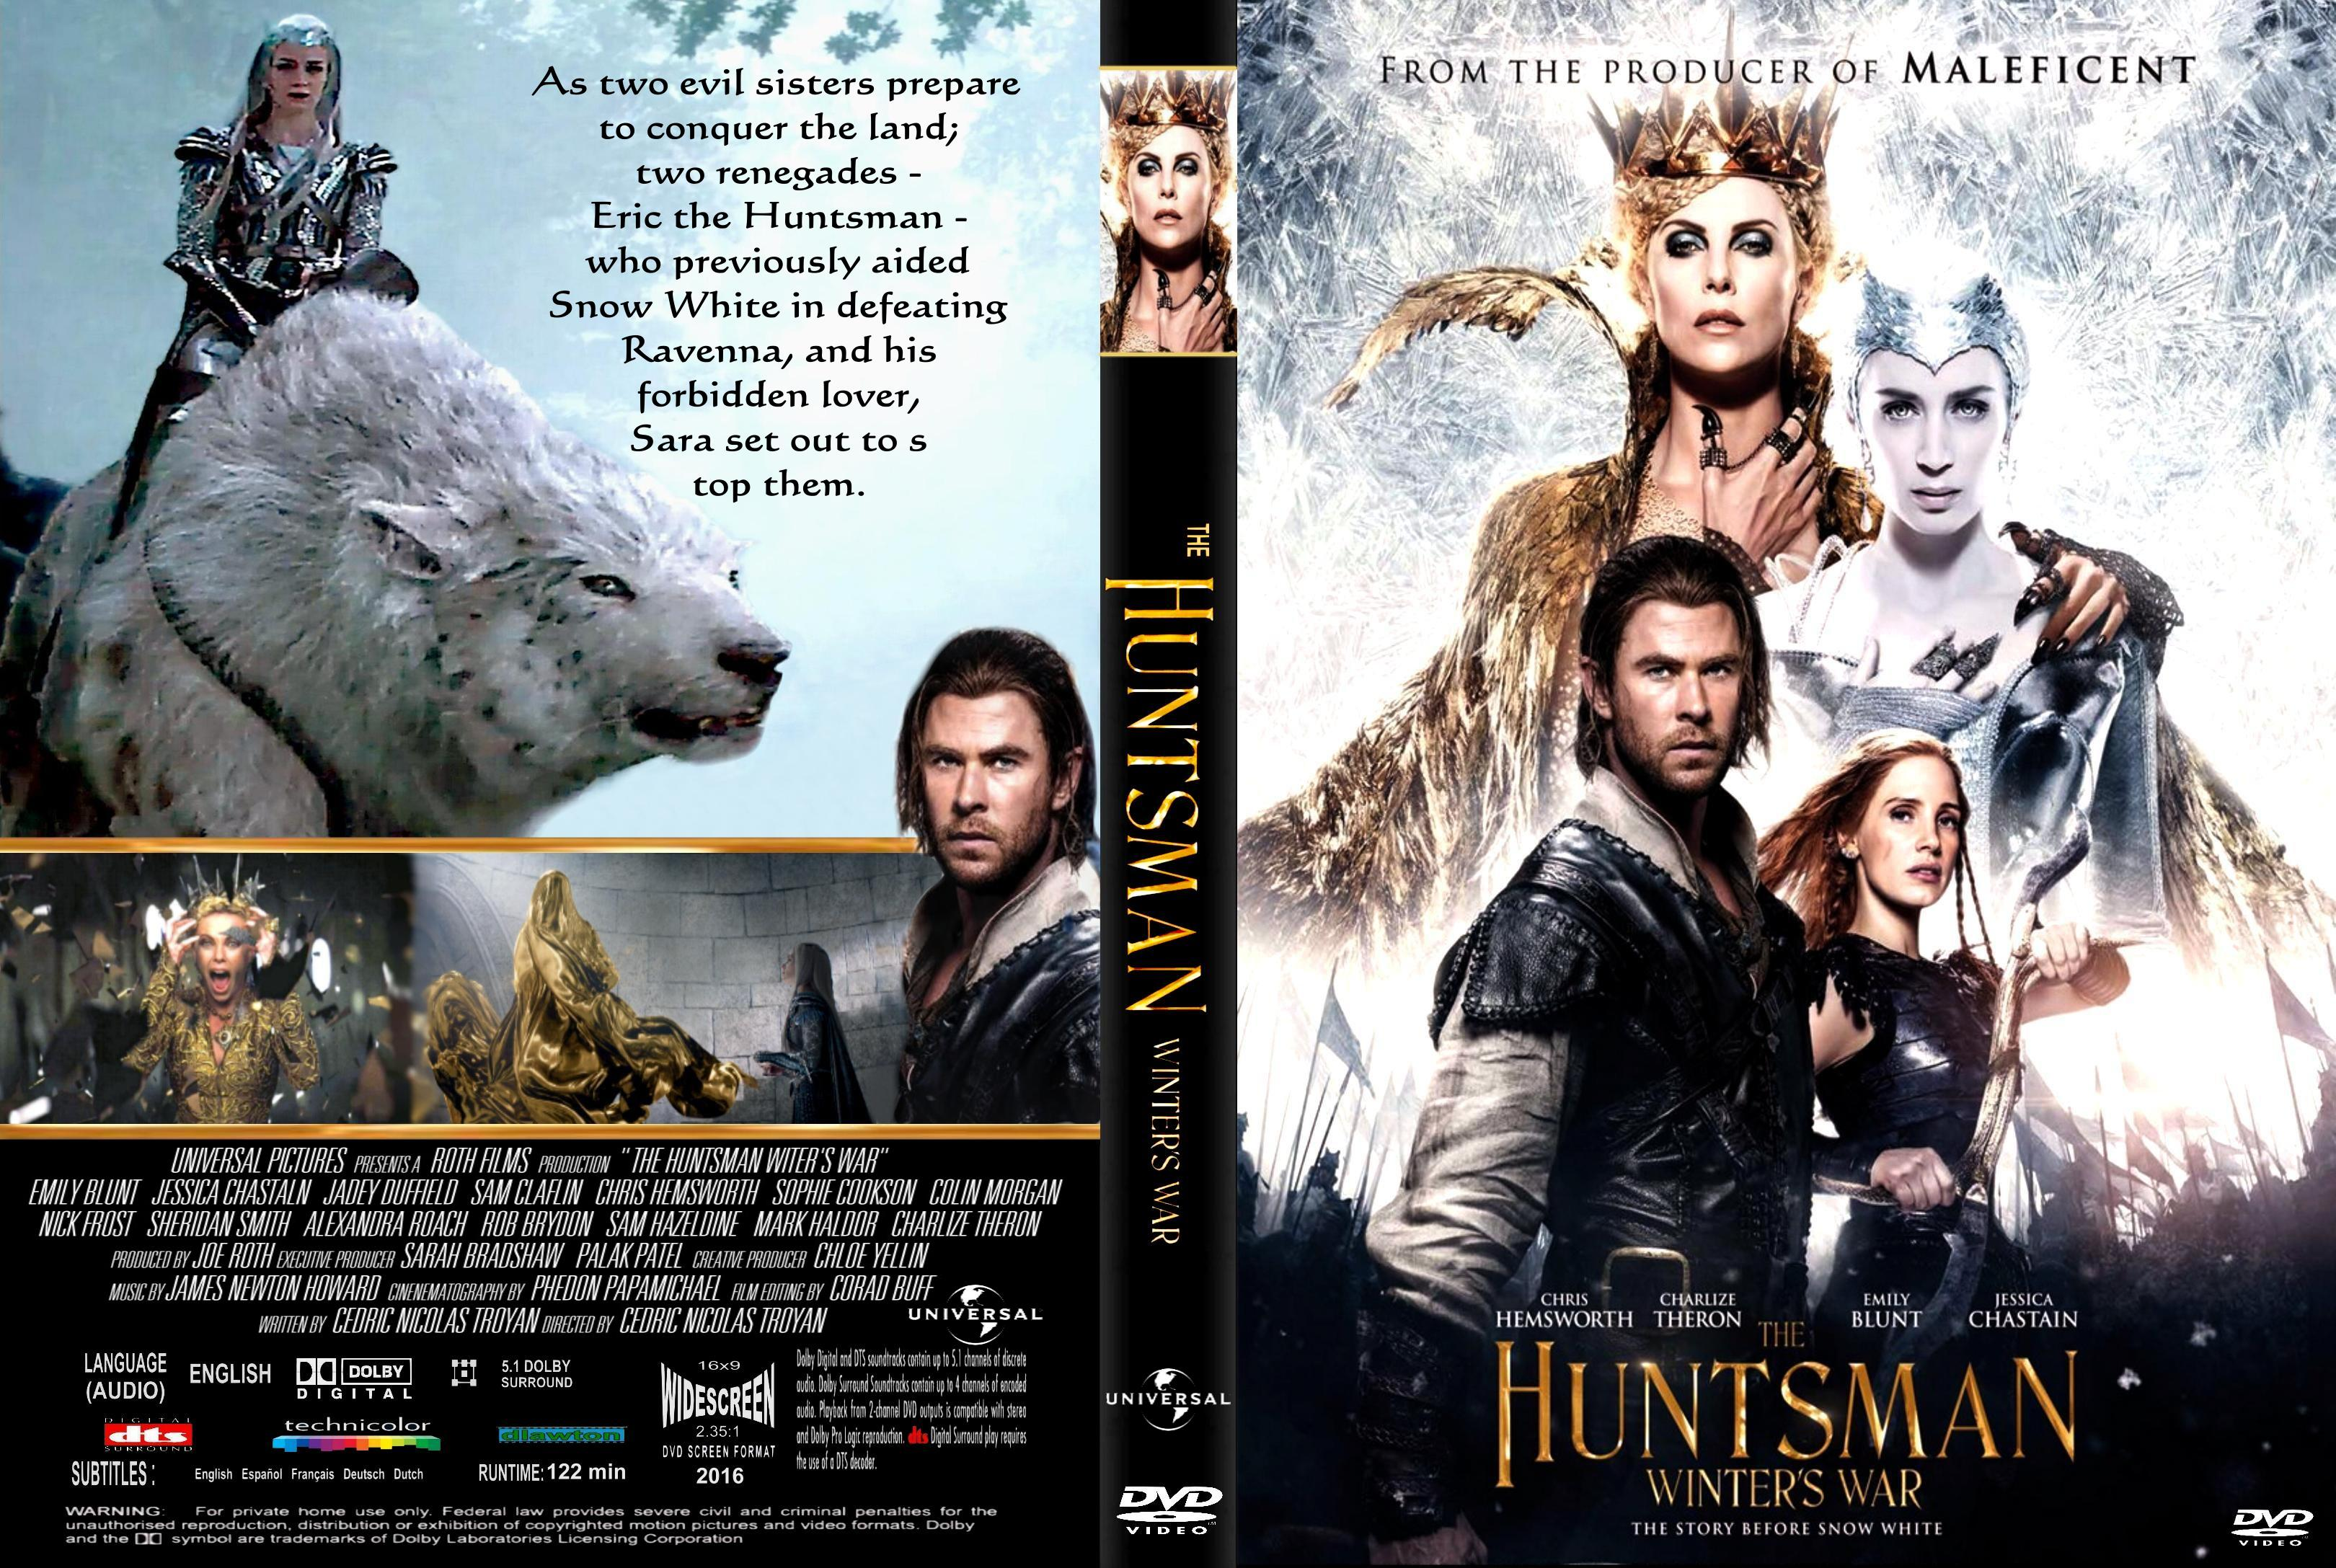 The Huntsman Winter's War (2016) okładka